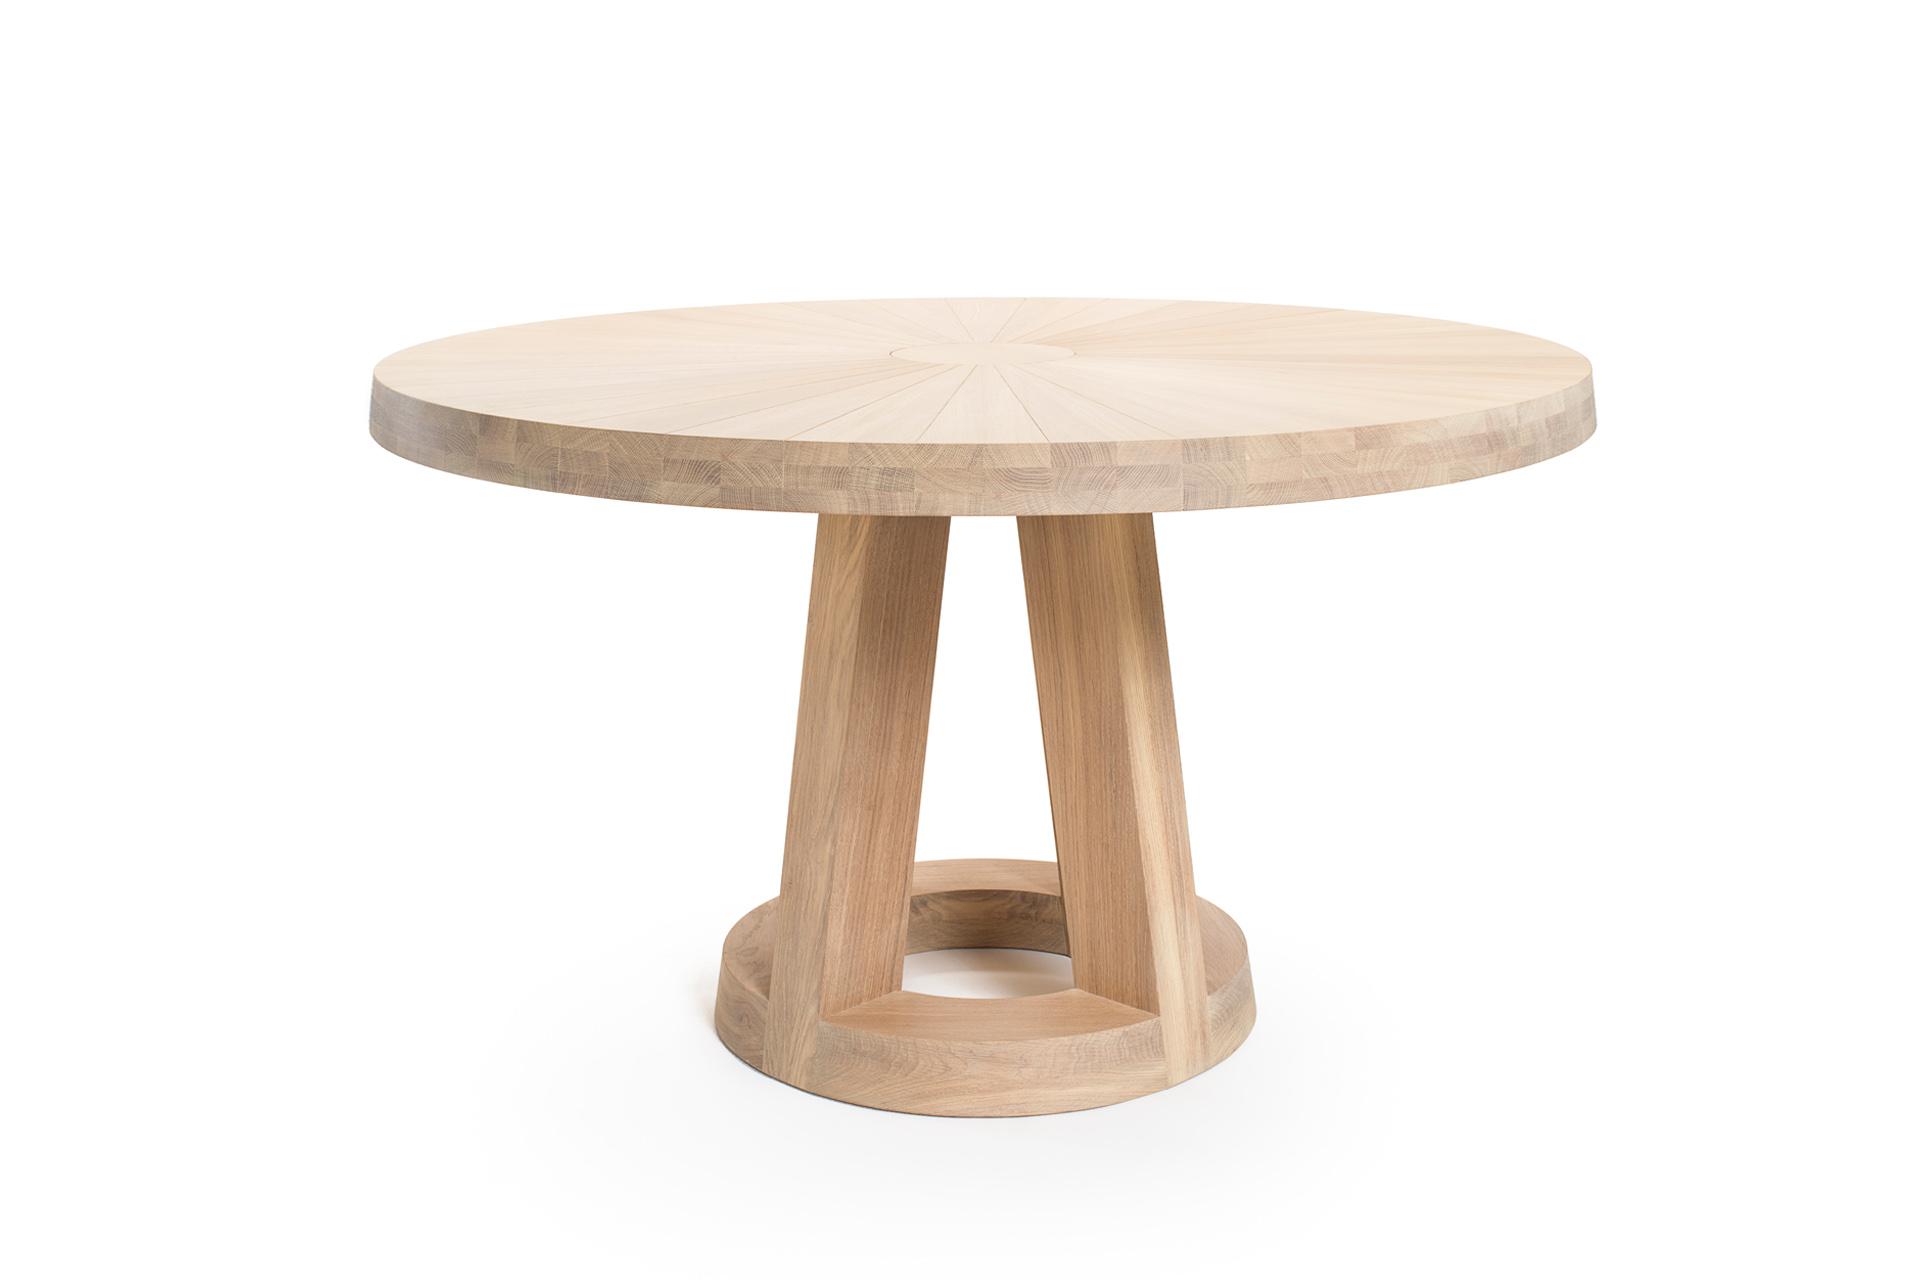 Zware Ronde Eettafel.Solid Ronde Design Tafel L Remy Meijers L Odesi Your Dutch Design